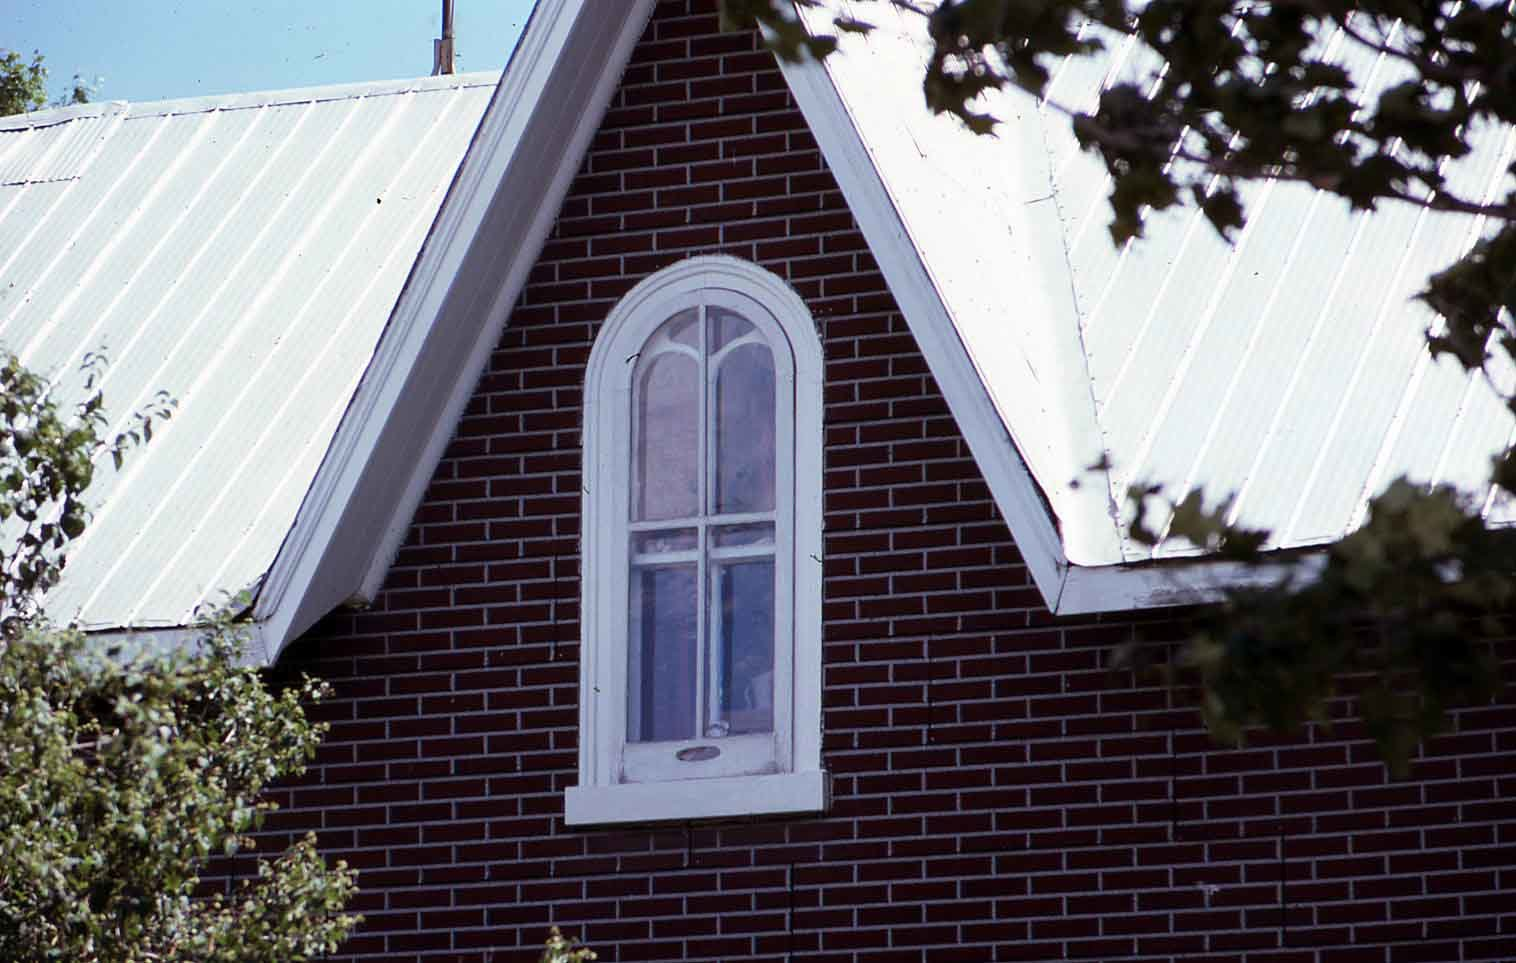 Window, location unknown